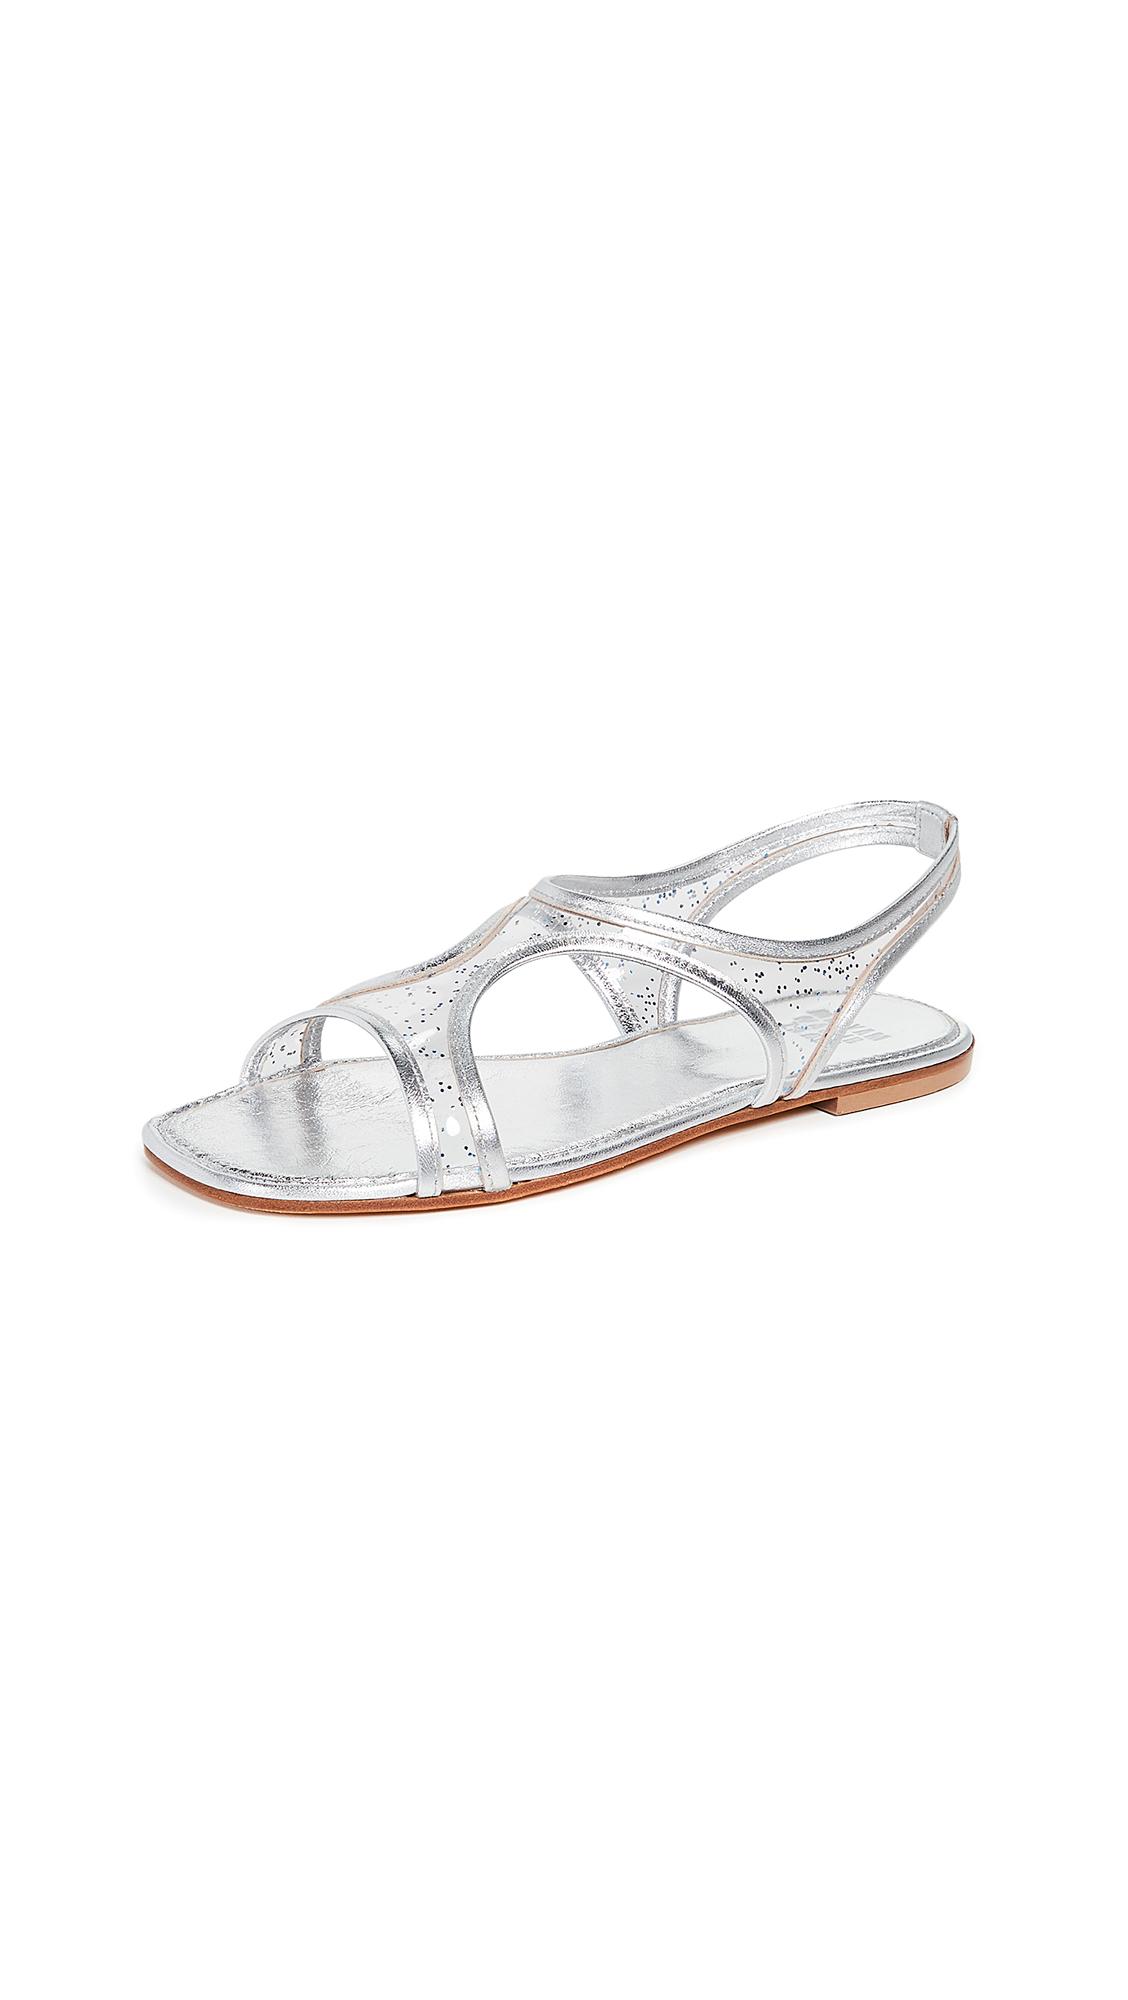 Maryam Nassir Zadeh Corazon Sandals - Blue Sparkle